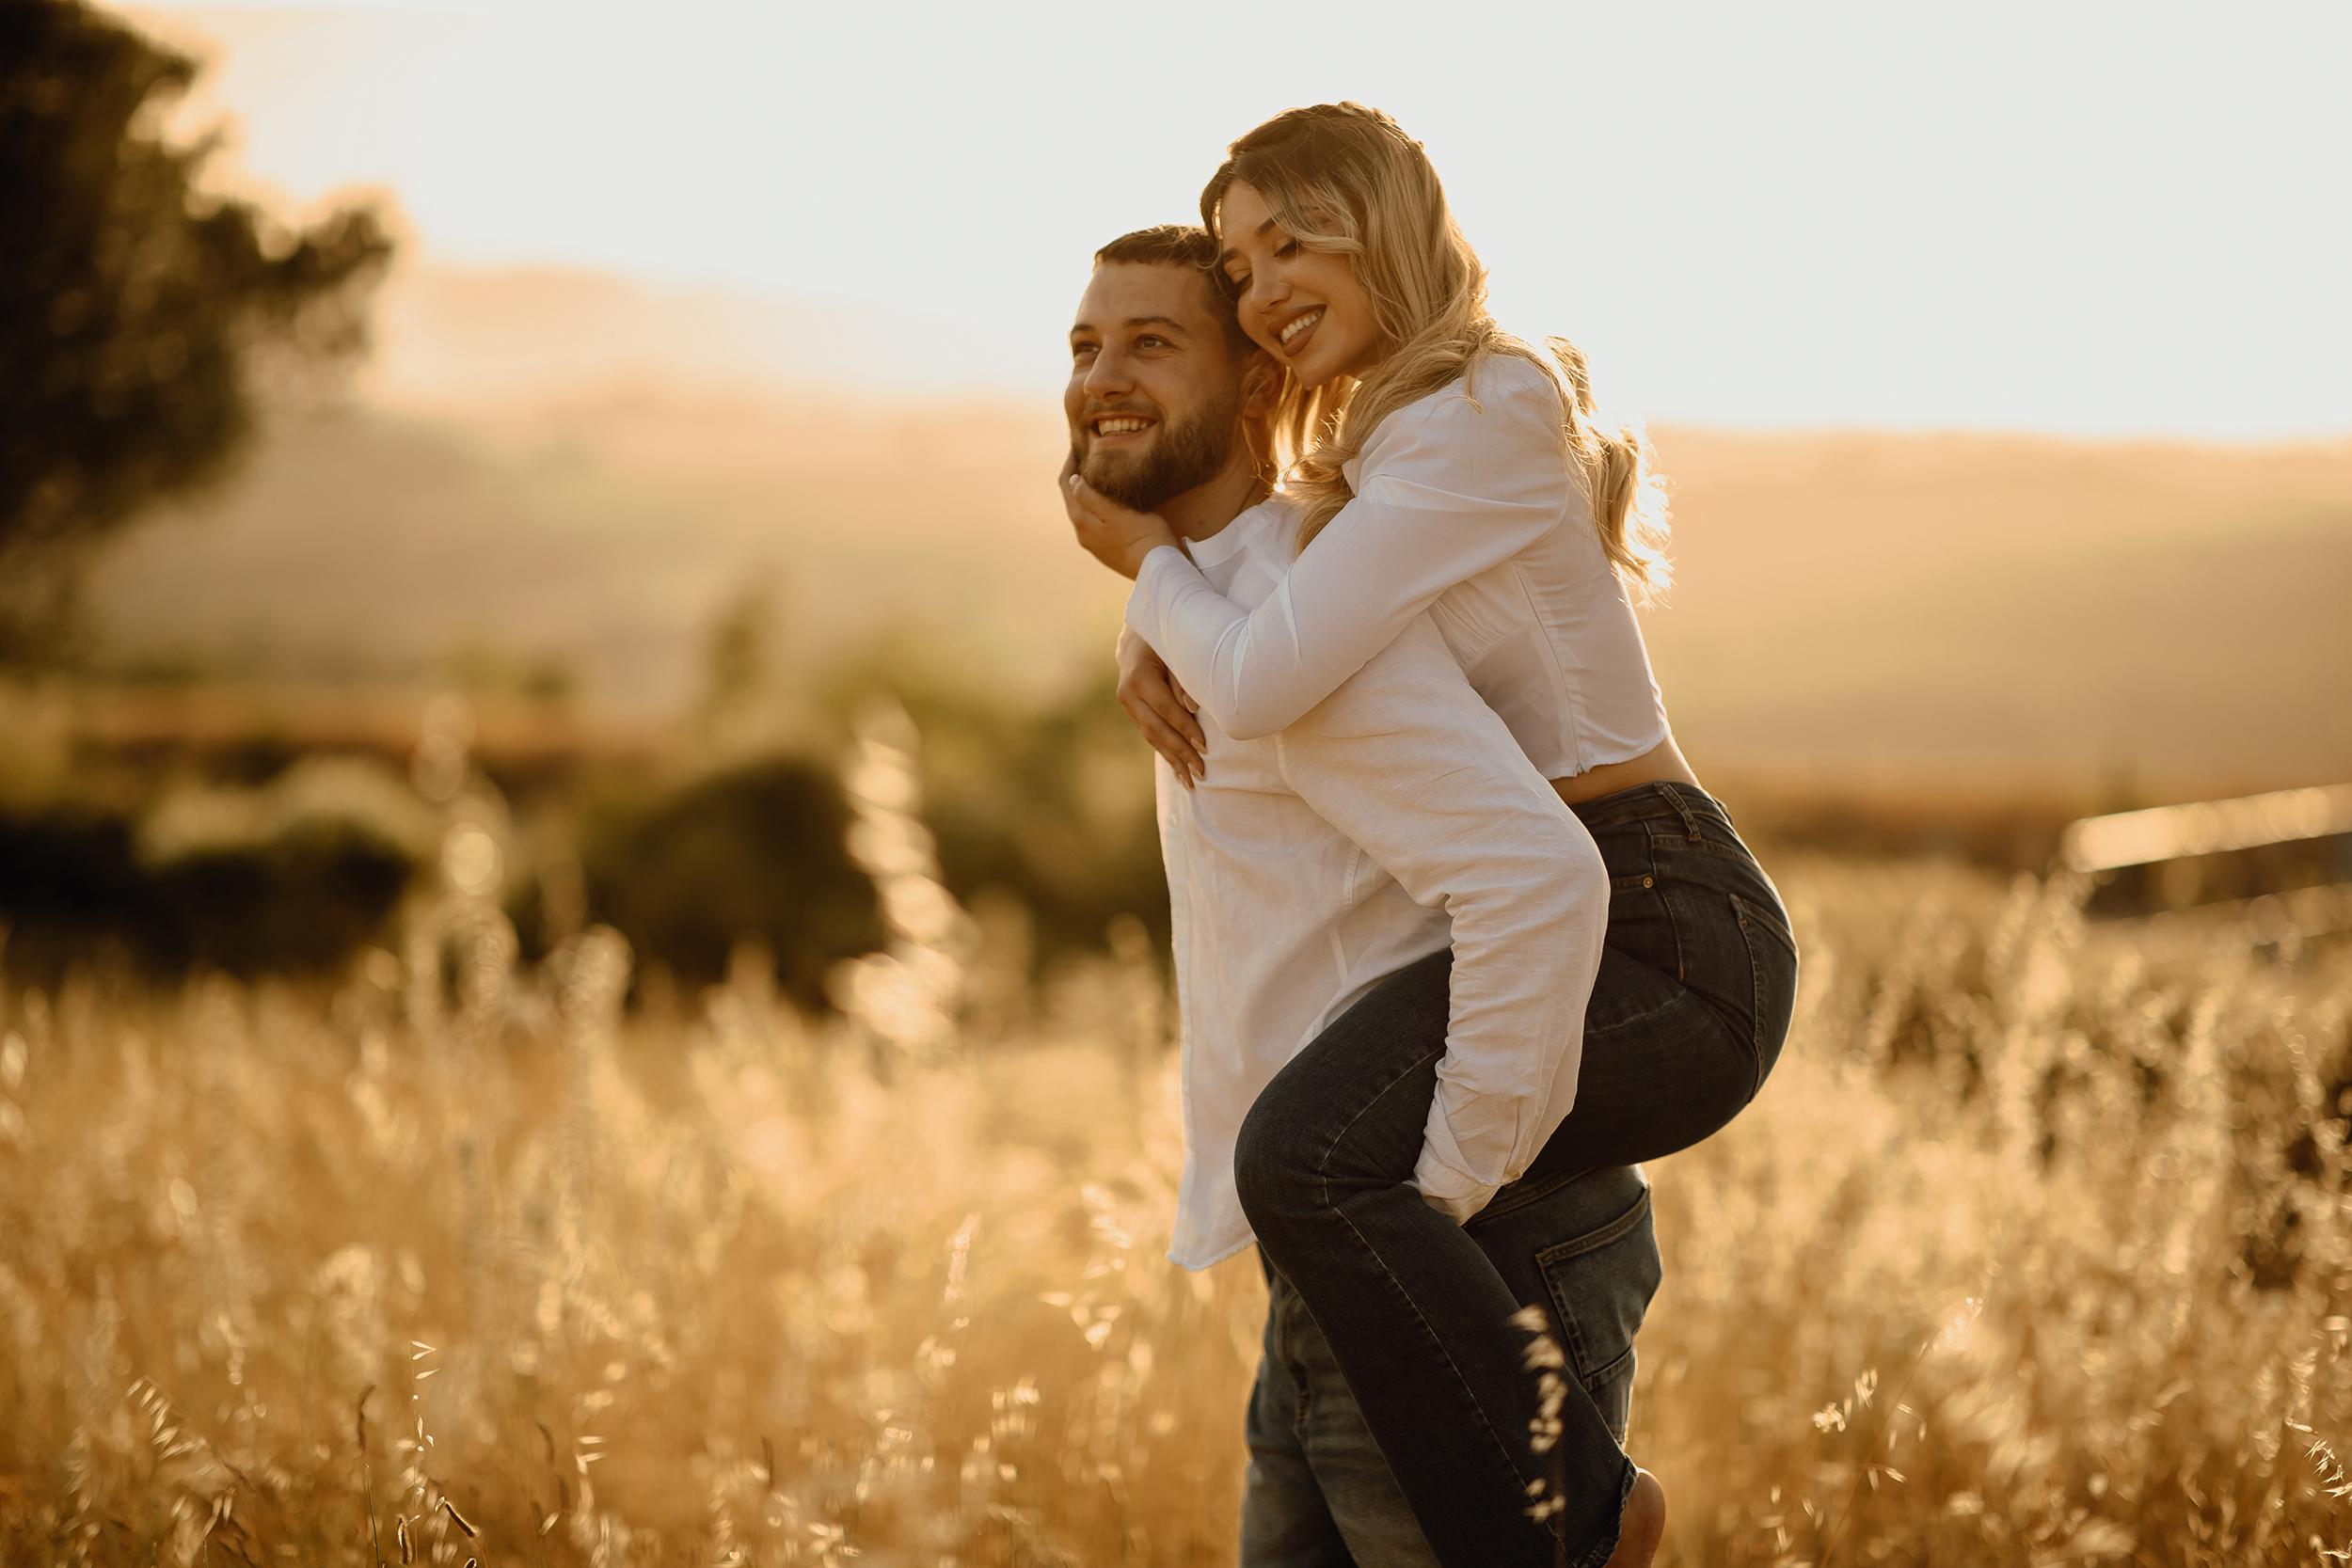 Boyfriend giving his girlfriend a piggyback ride to his girlfriend